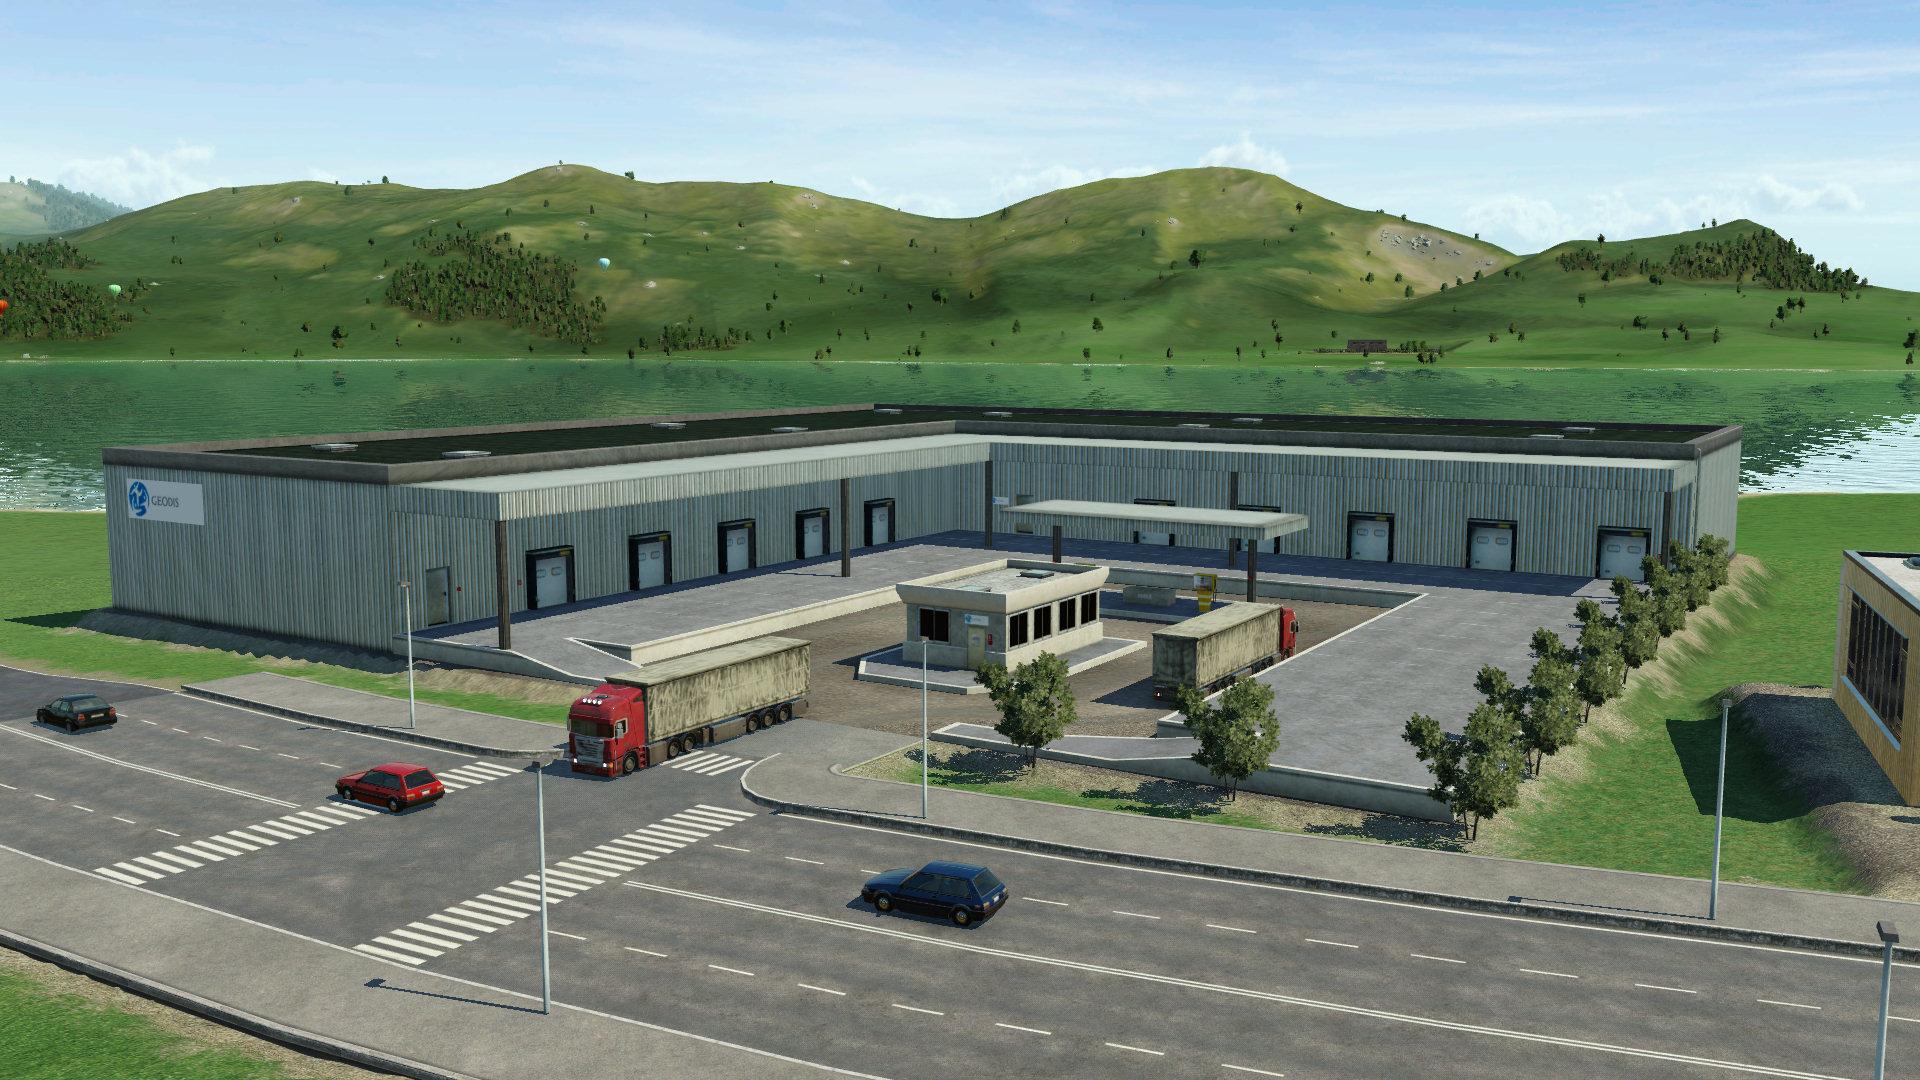 Transport Fever 2 - Geodis Truck Station